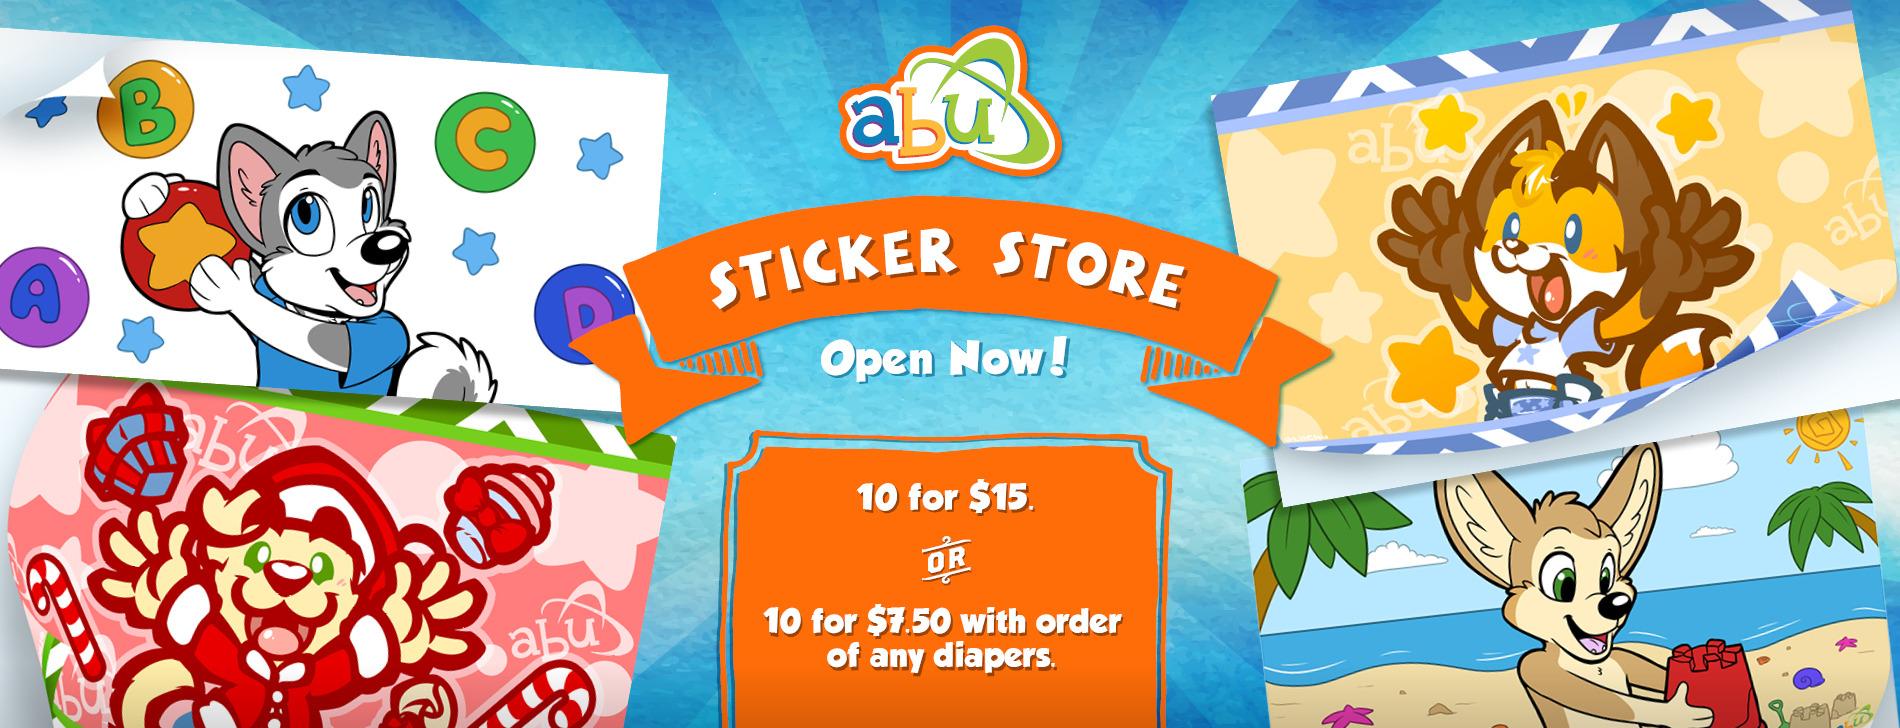 StickerStore-Website-Banners-edit